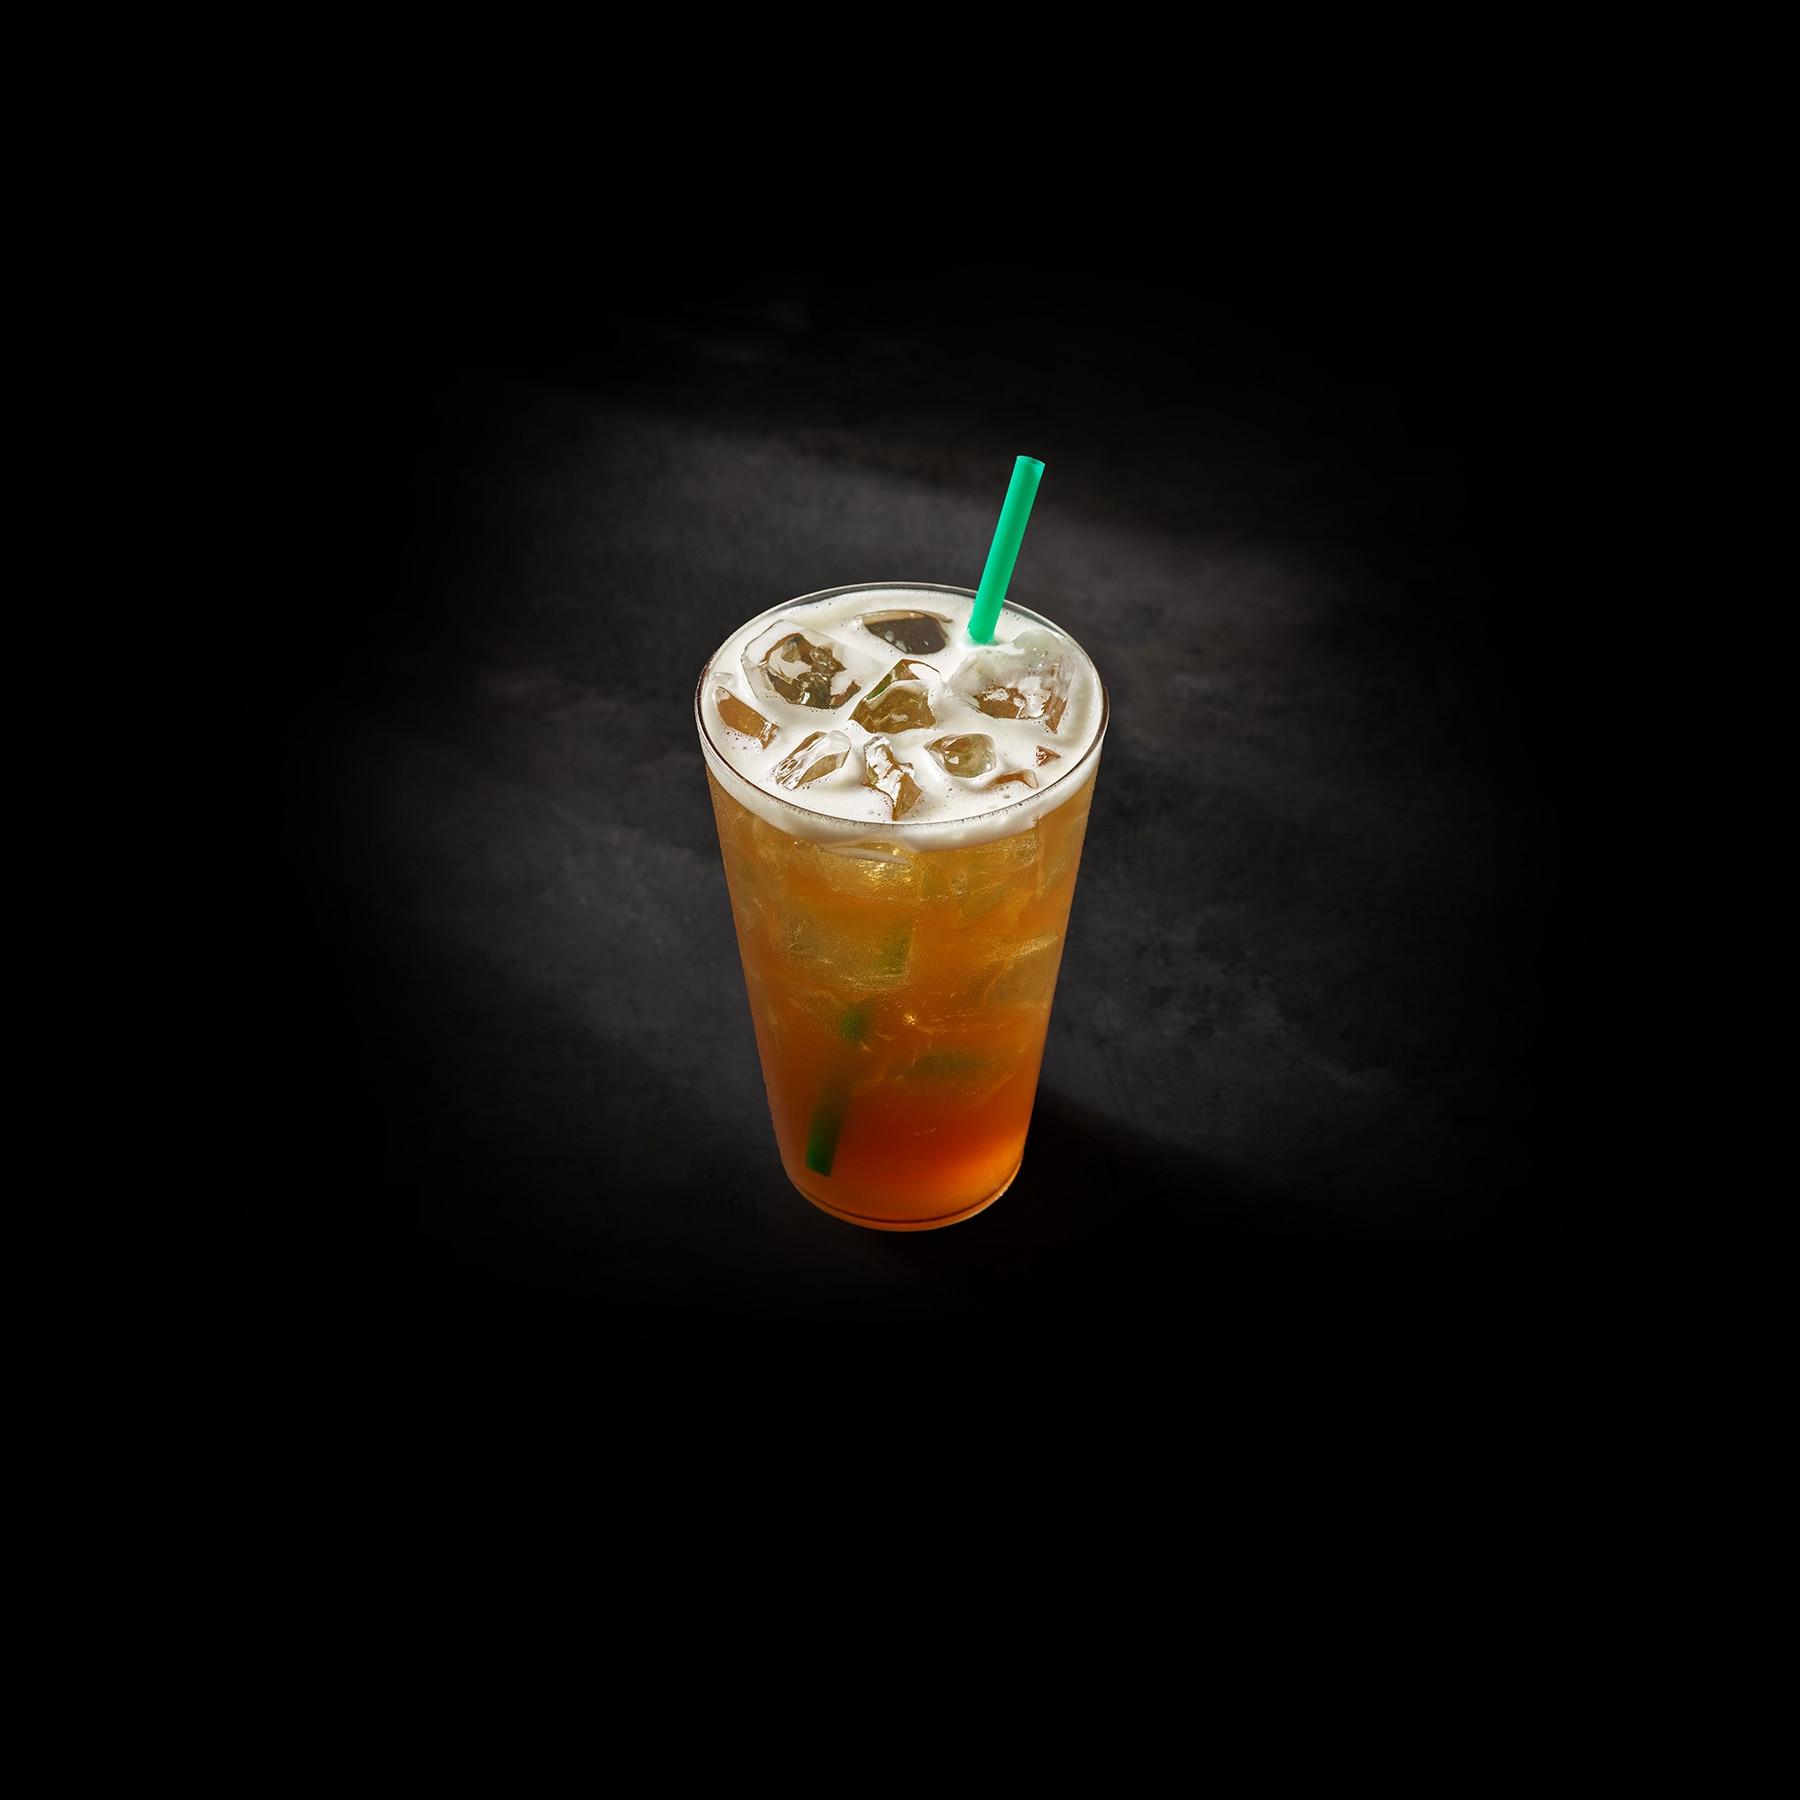 Teavana Shaken Pineapple Black Tea Infusion Starbucks Coffee Company